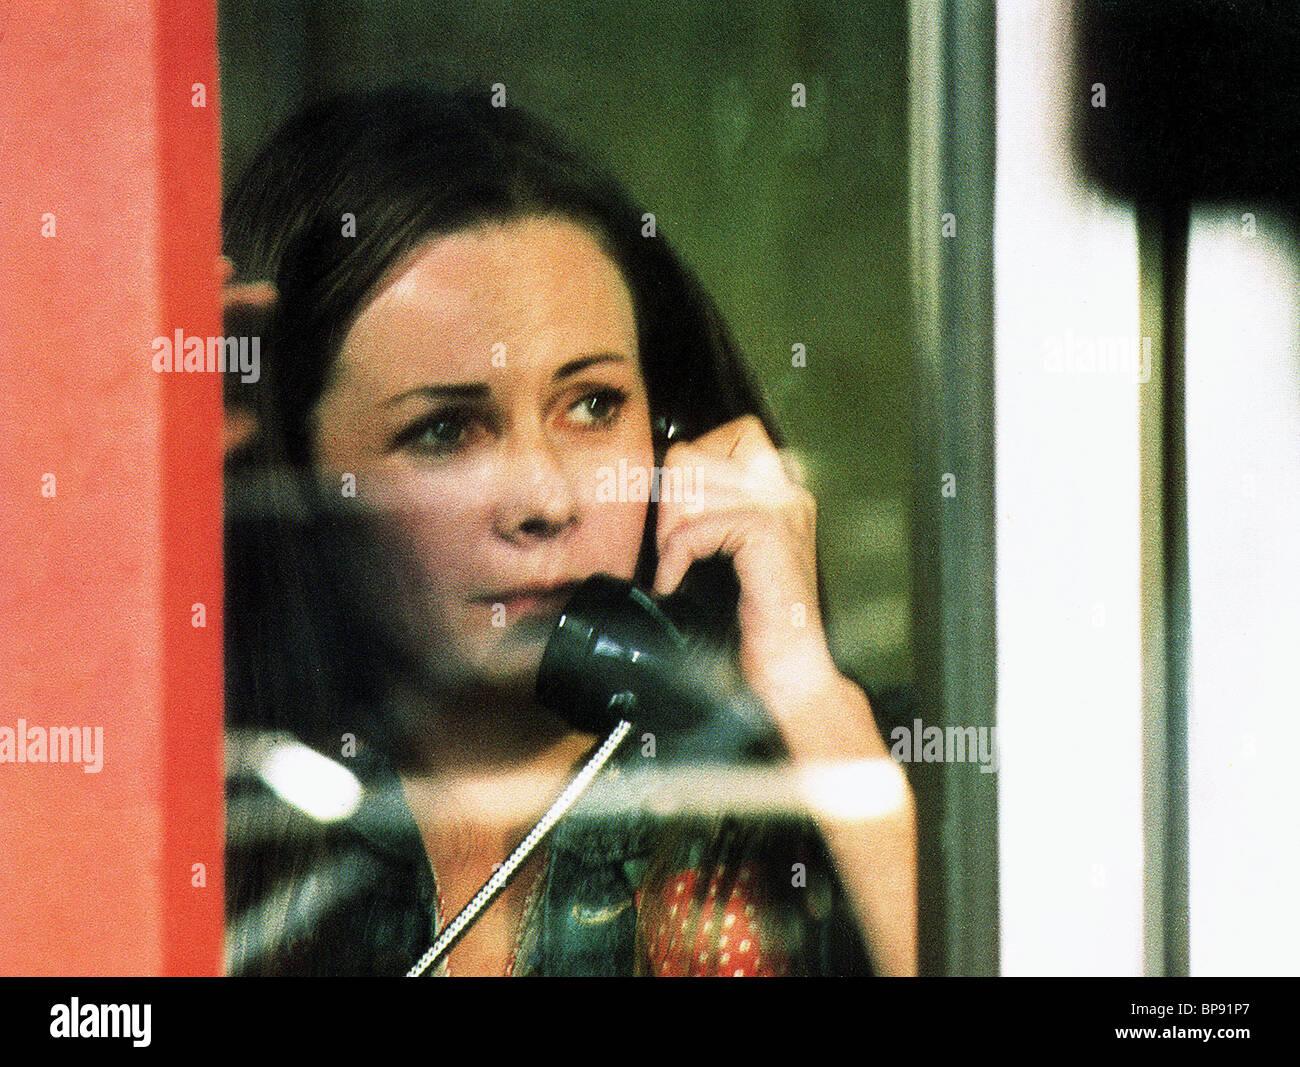 Jodi Santamaria (b. 1982),Timothy Spall (born 1957) Porn clips Ayesha Curry,Tina Aumont